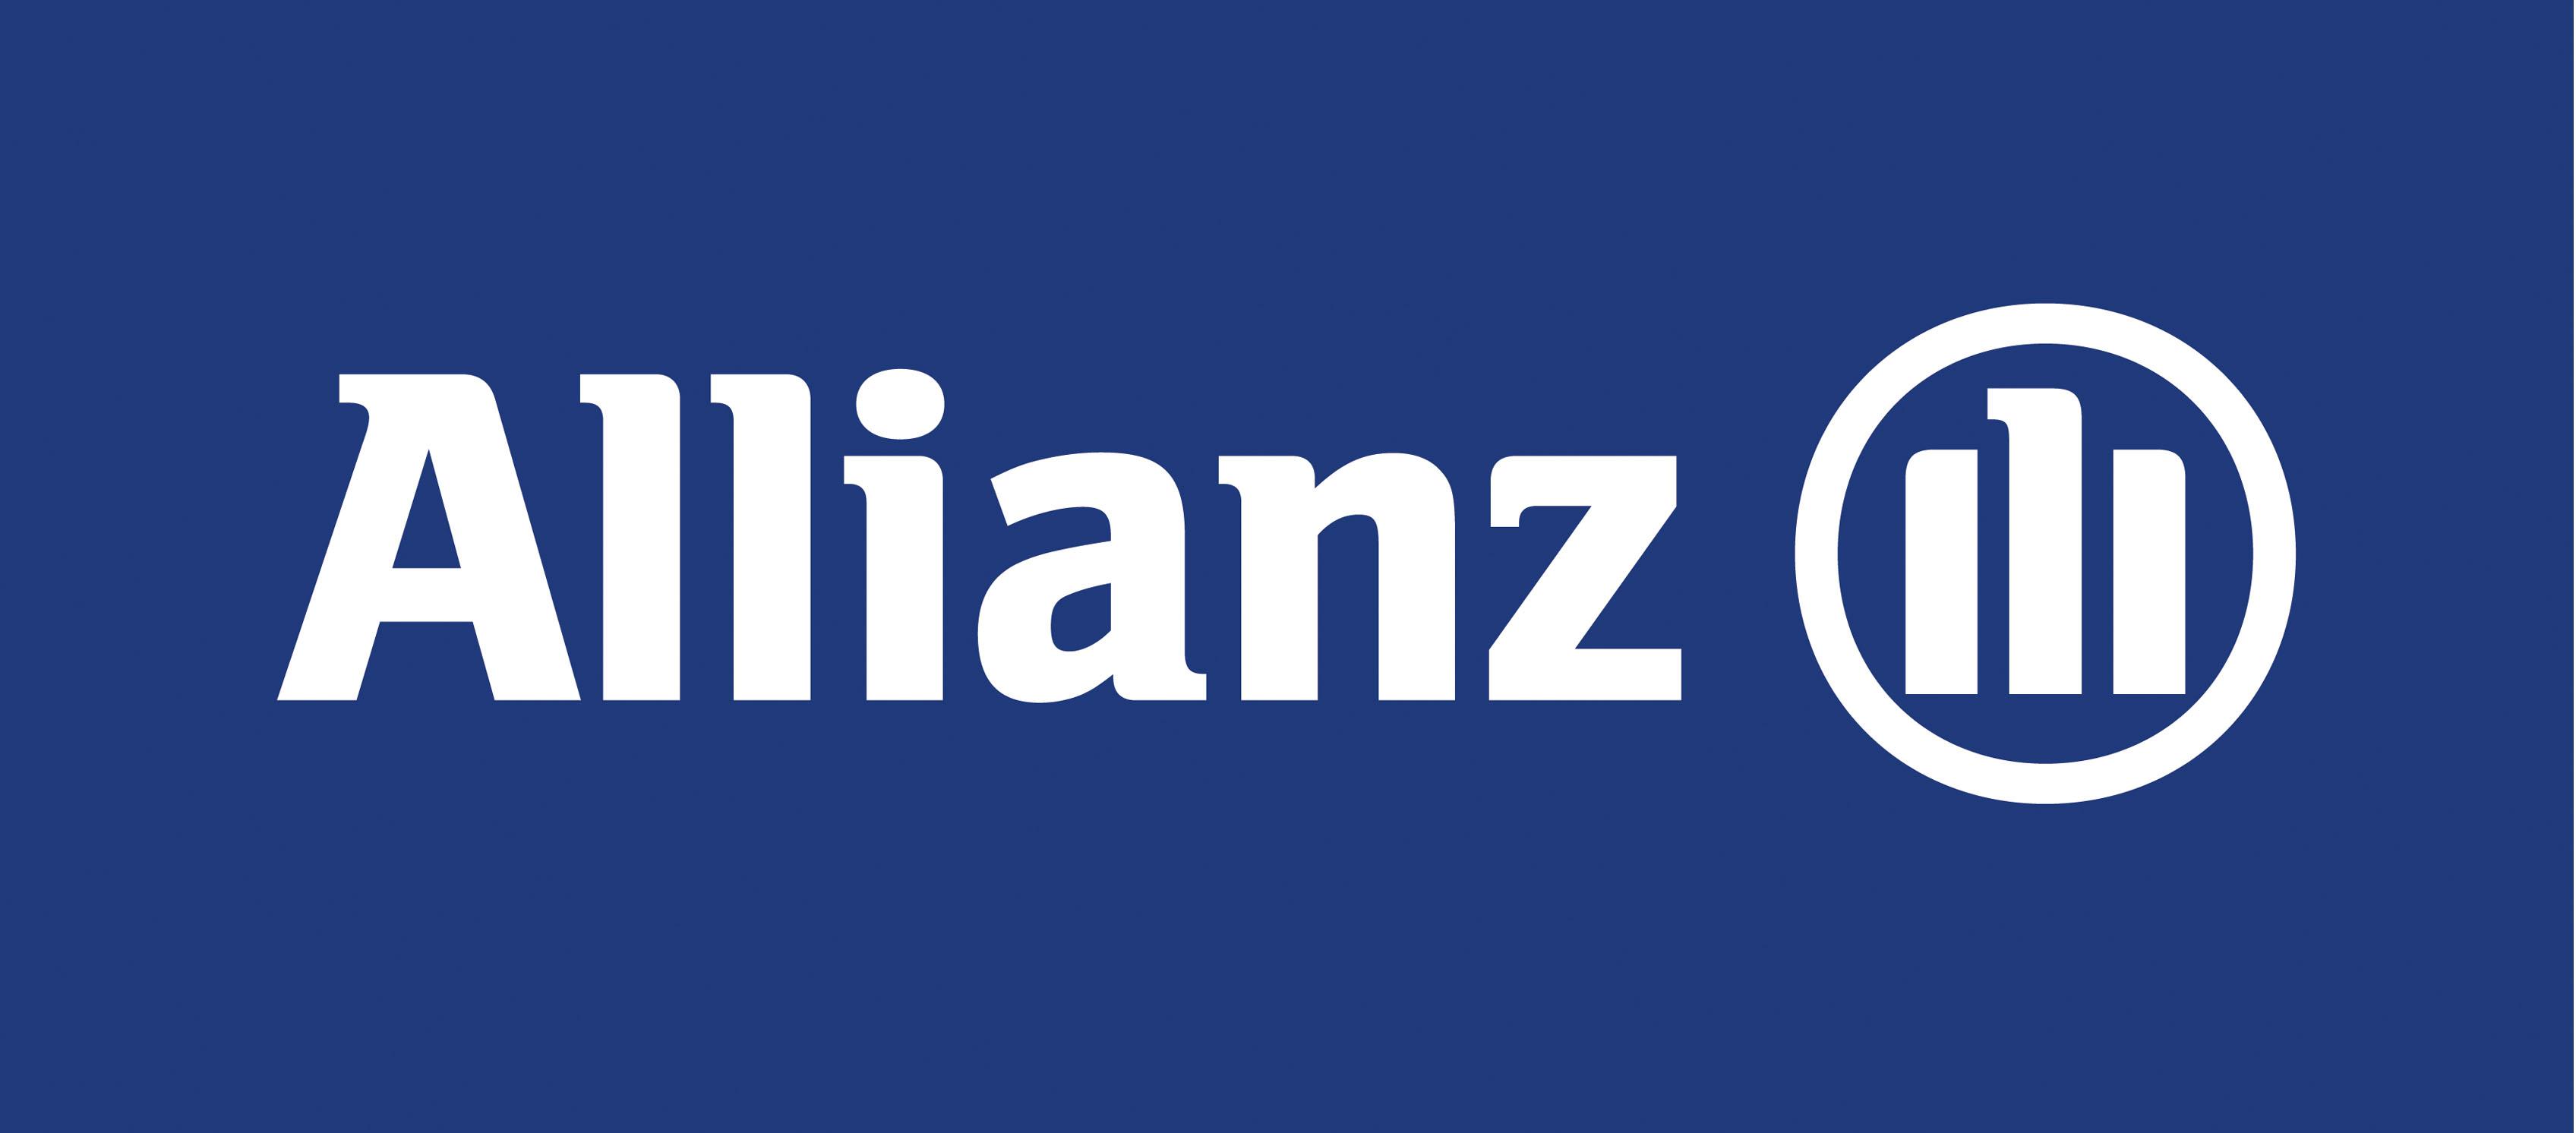 1 - allianz1